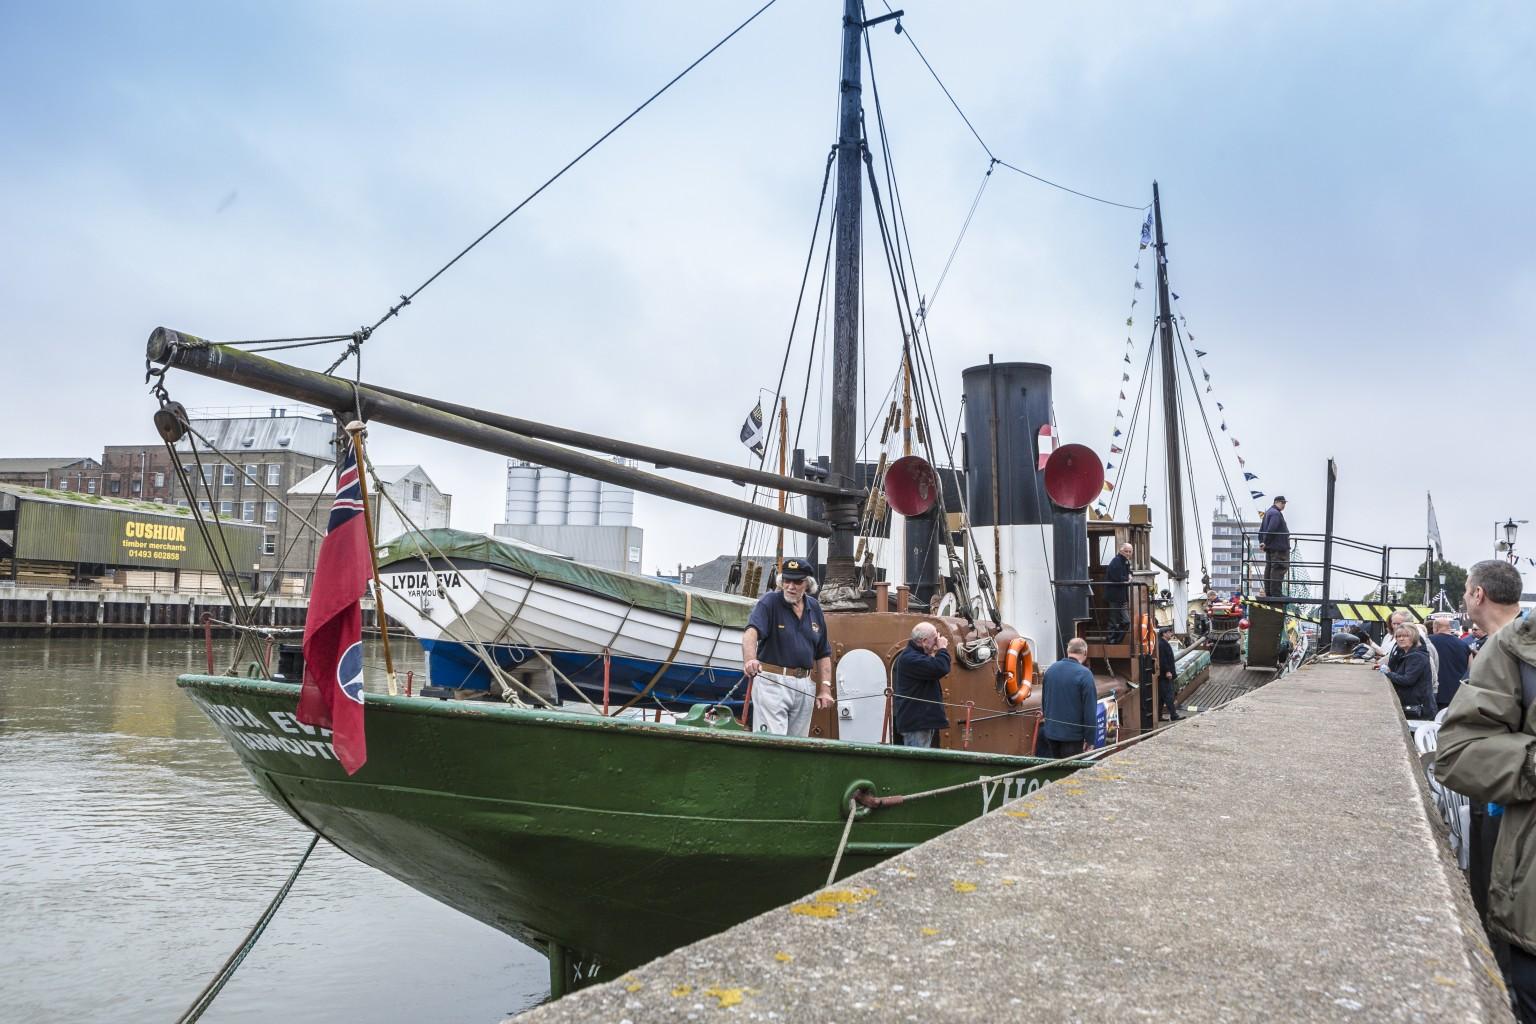 Maritime Festival - 1460